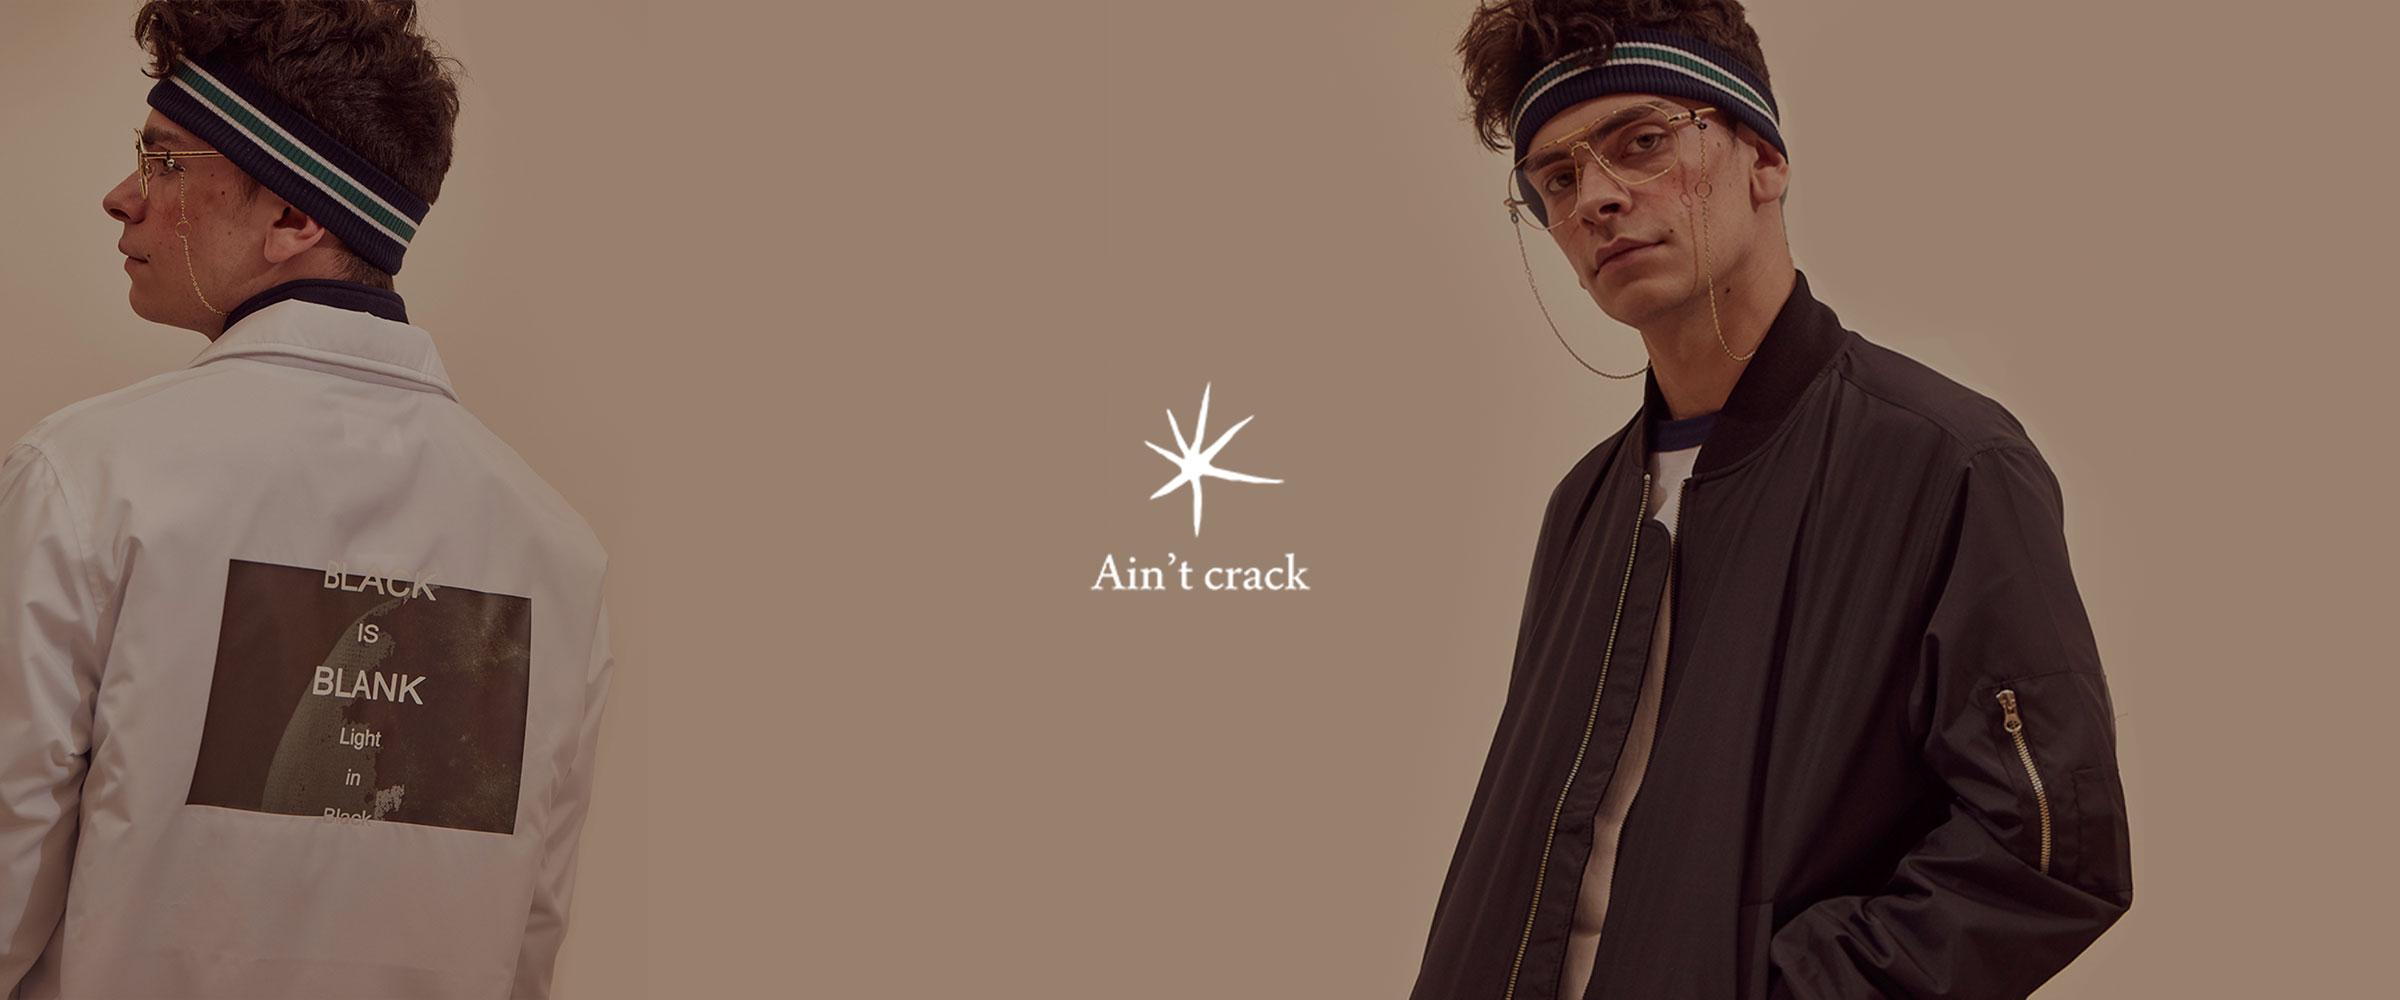 aintcrack.jpg